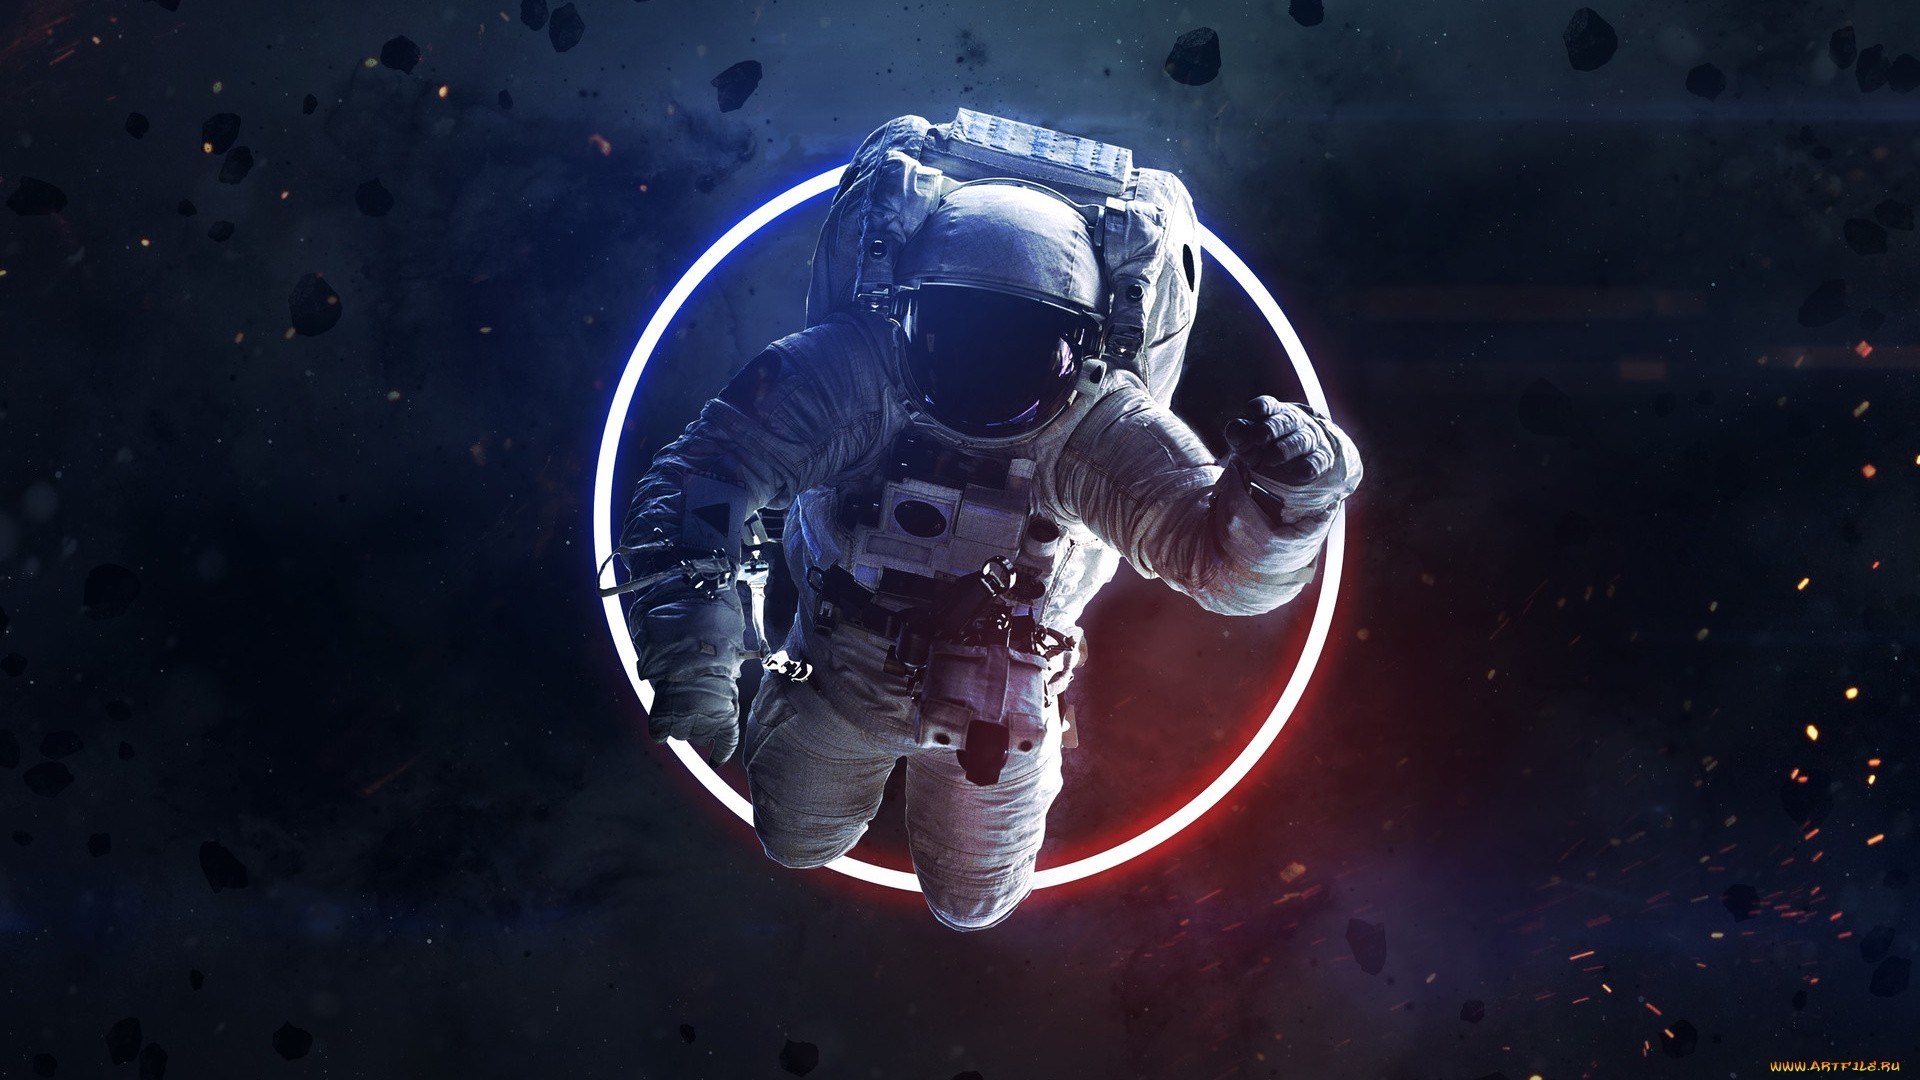 Astronaut Free Wallpaper